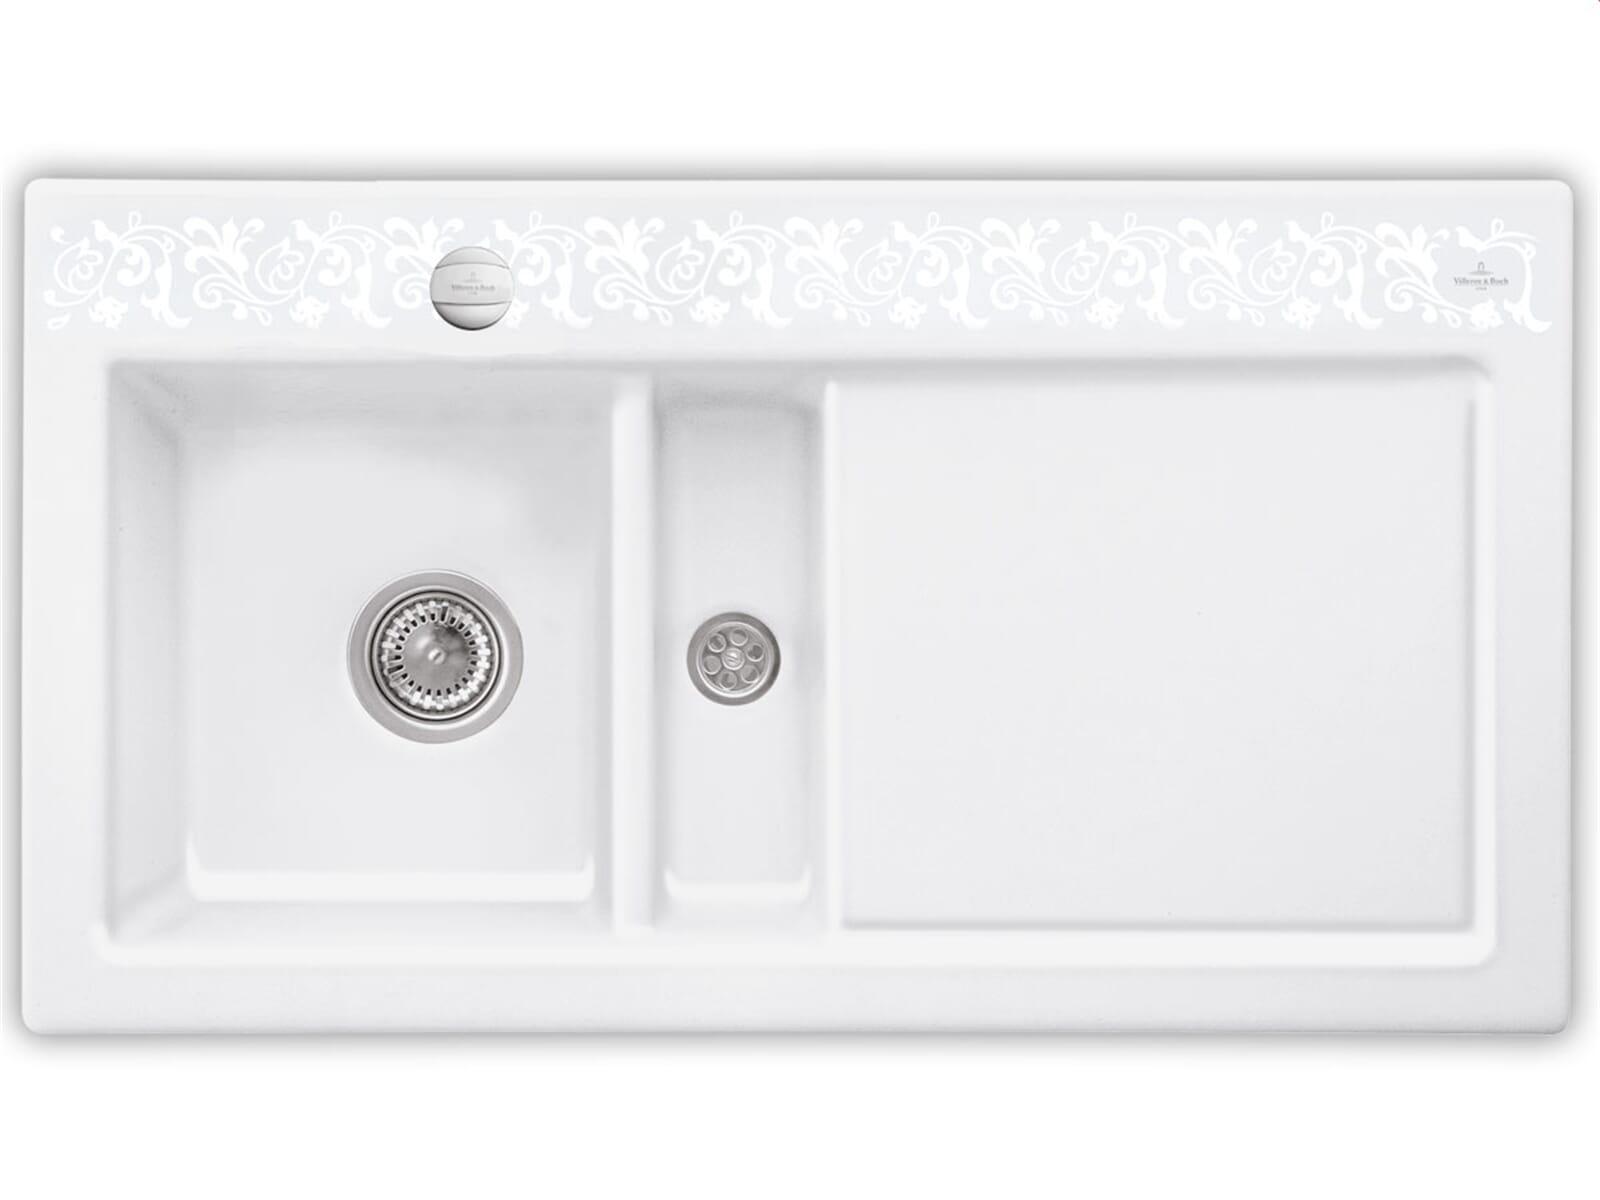 villeroy boch subway 50 white pearl keramik sp lbecken dekor wei k chensp le ebay. Black Bedroom Furniture Sets. Home Design Ideas